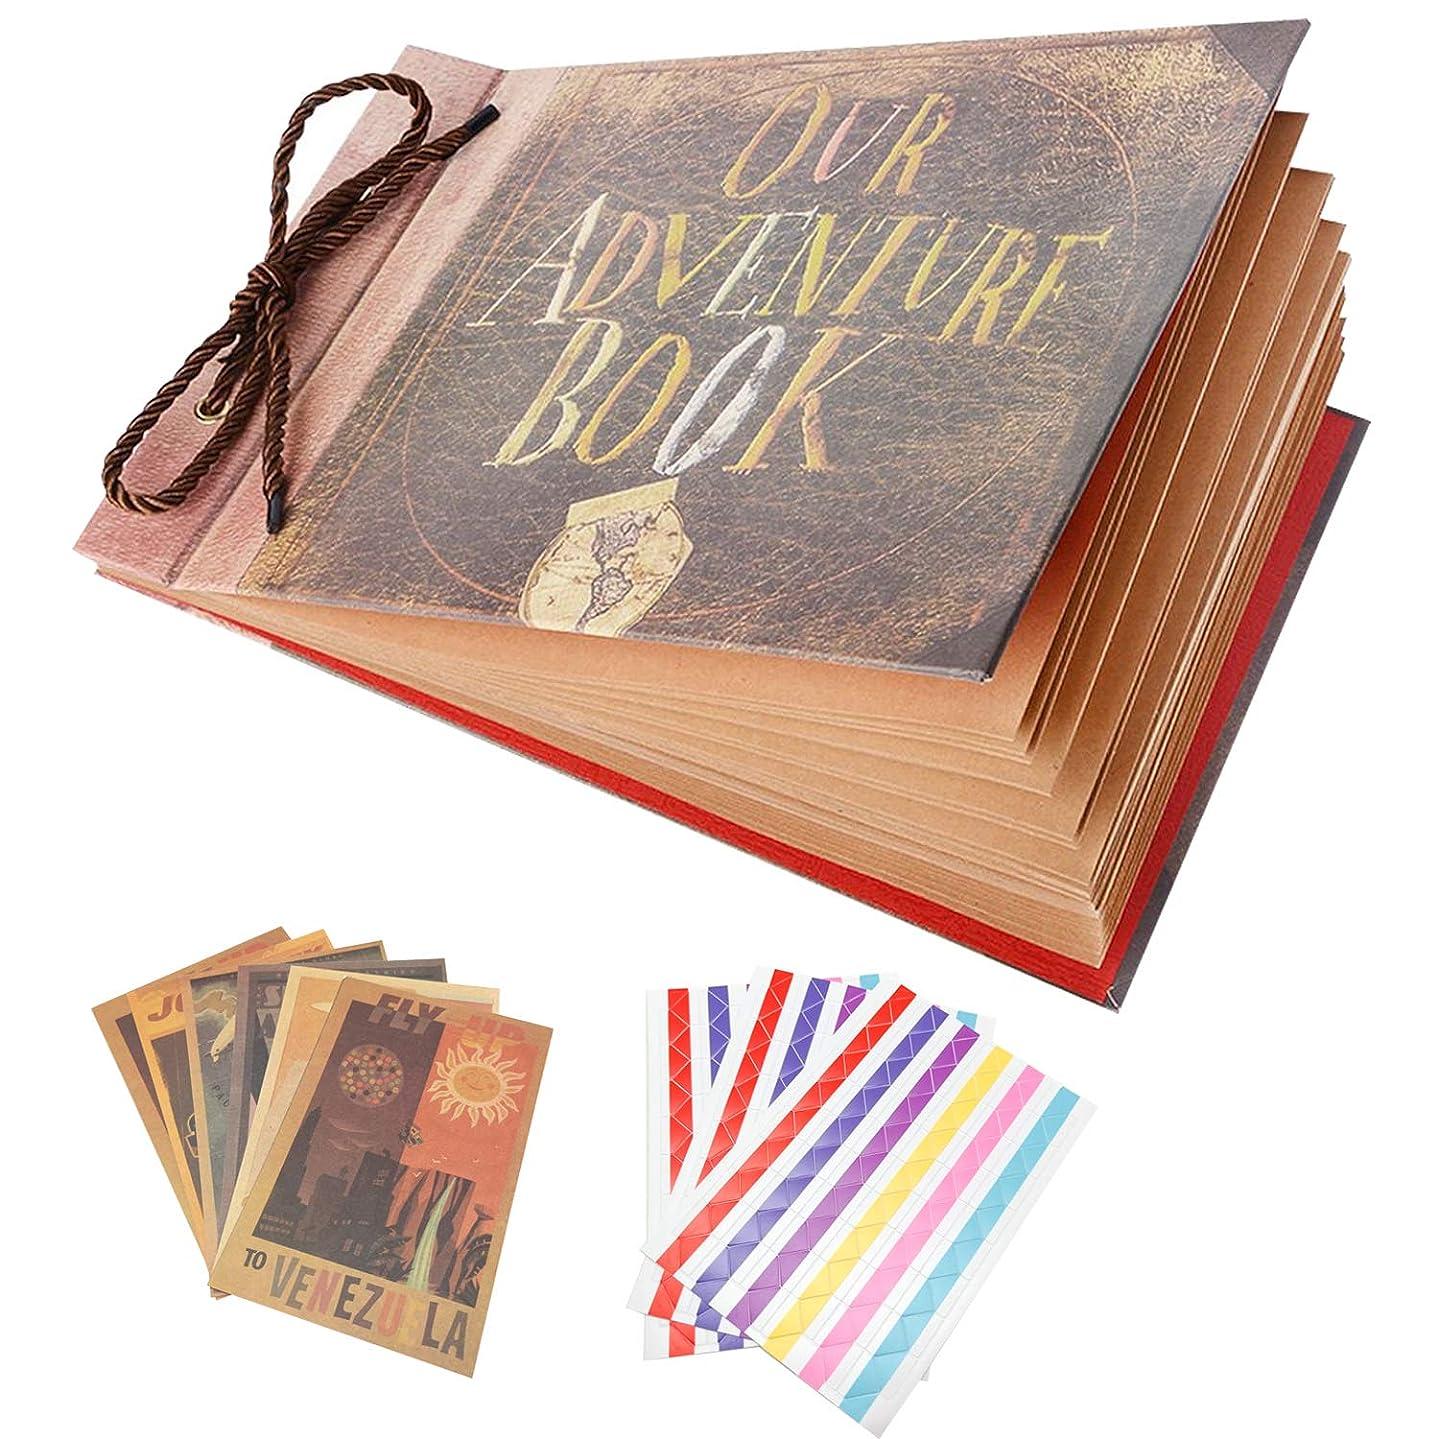 SAIBANG Photo Album Scrapbook, DIY Handmade Album Scrapbook Movie Up Travel Scrapbook for Anniversary, Wedding, Travelling, Baby Shower, etc (Our Adventure Book)